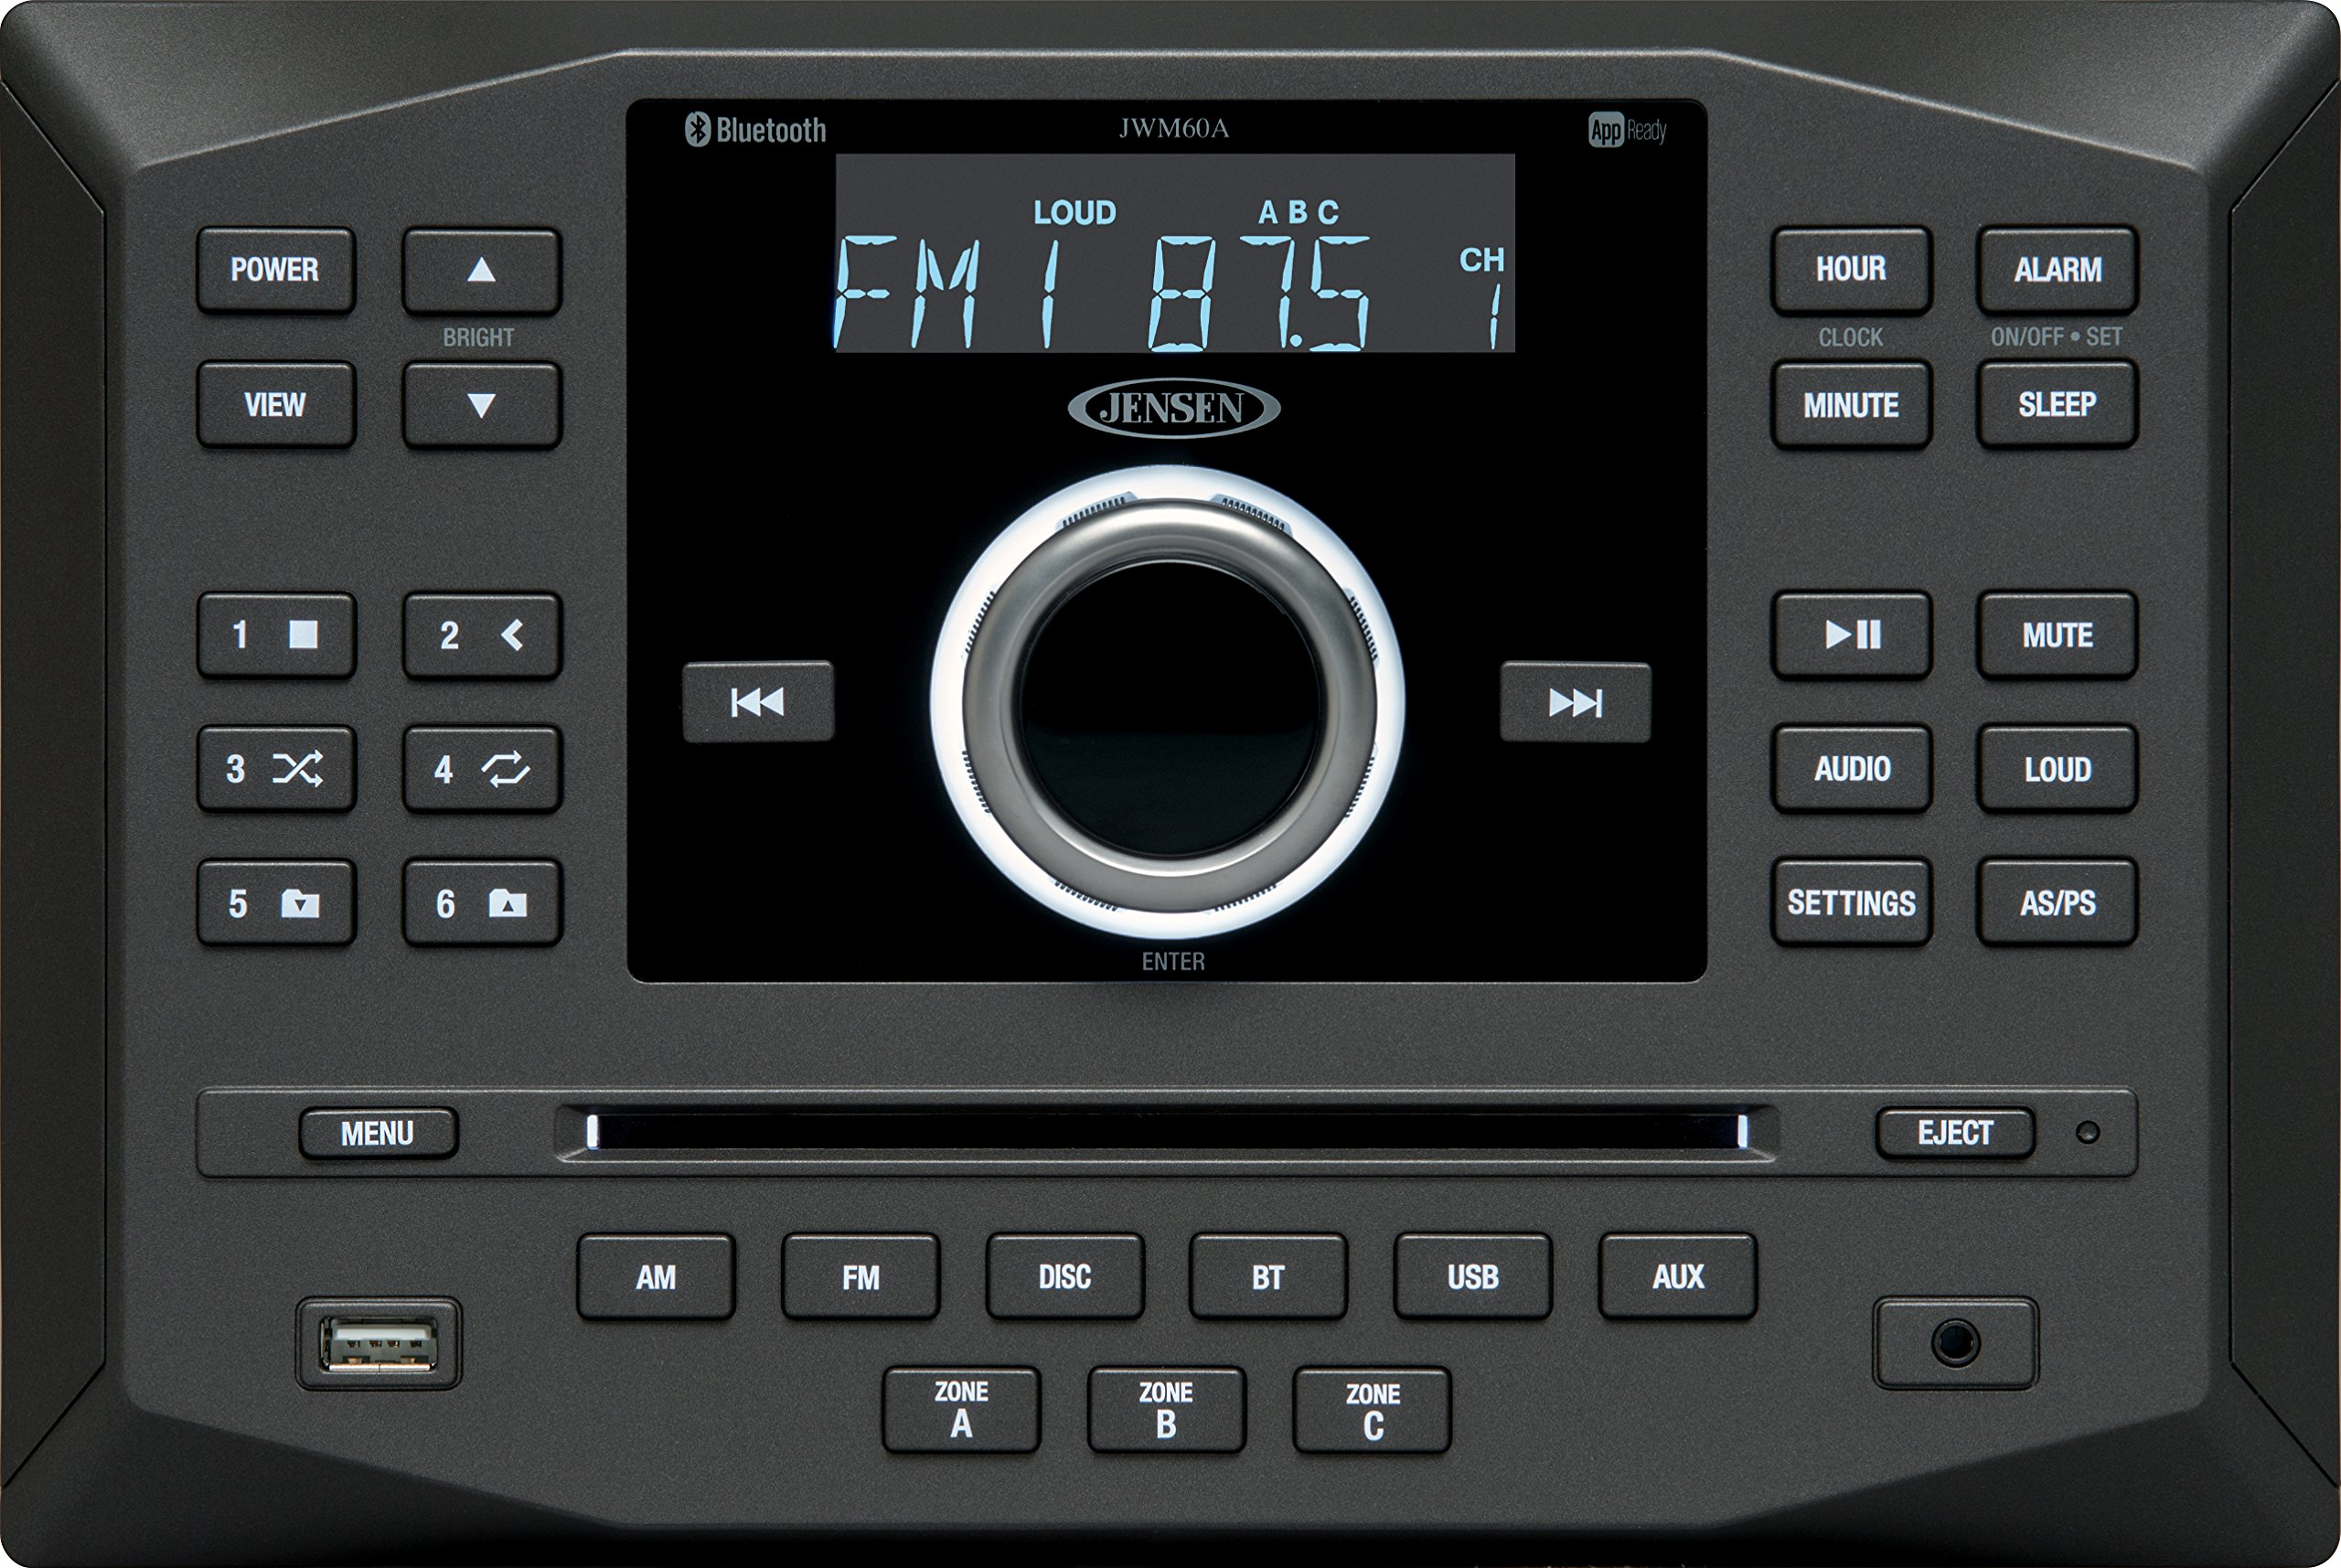 Jensen JWM60A AM|FM|DVD|CD|USB|AUX|HDMI|App Ready Bluetooth Wallmount Stereo with App Control, Plays: CD, CD-R, CD-RW, DVD, DVD+RW, DVD-RW, MP3, DVD-Video, MPEG-4, VCD, JPEG, CD-DA, MP3, WMA, Dolby